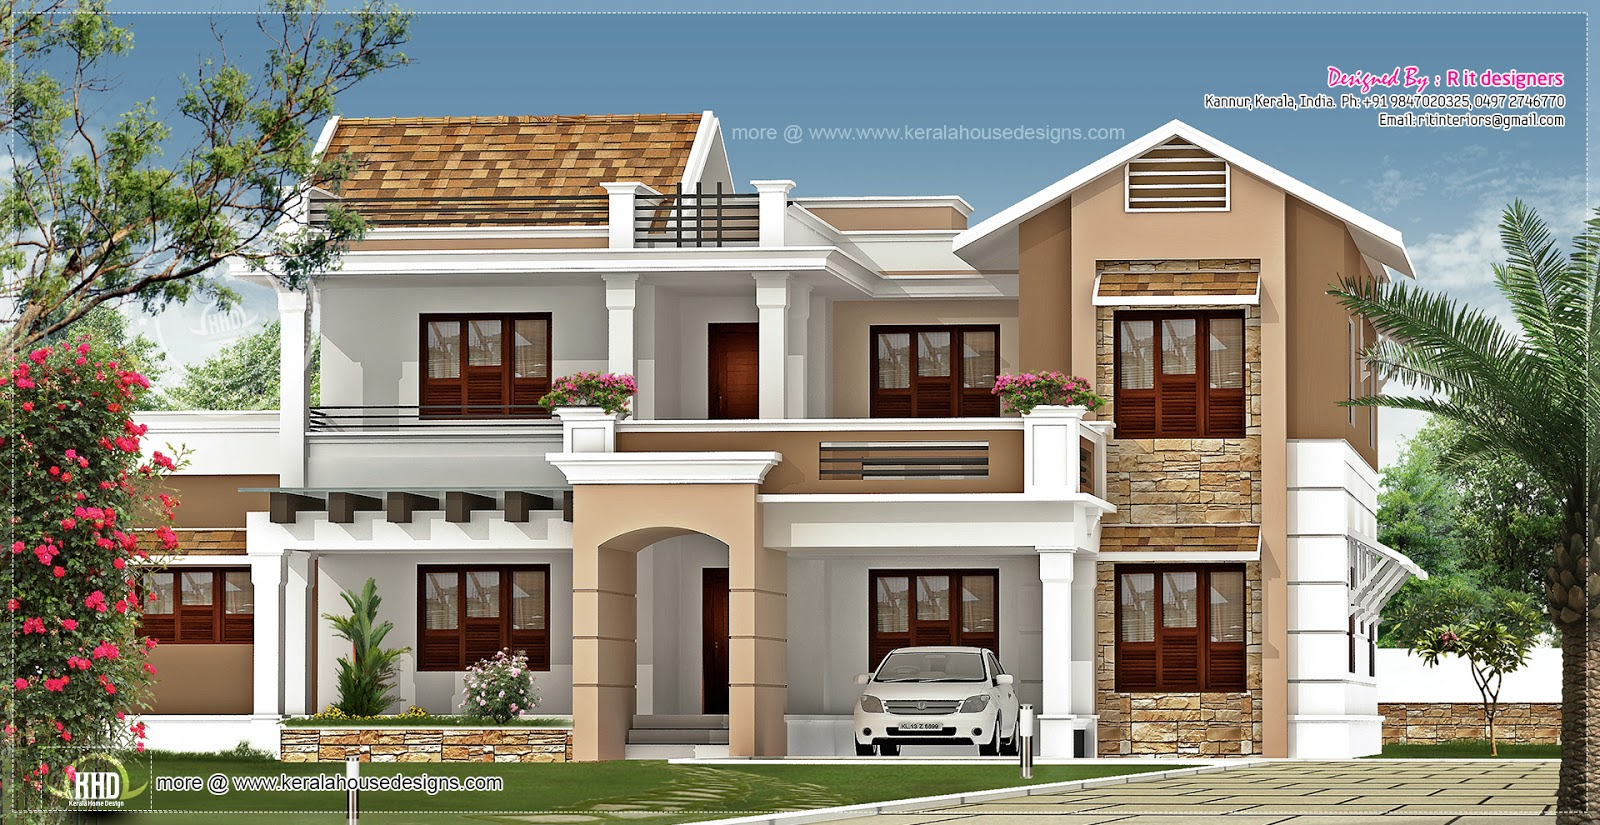 New villa exterior design in 3740 sqfeet House Design Plans